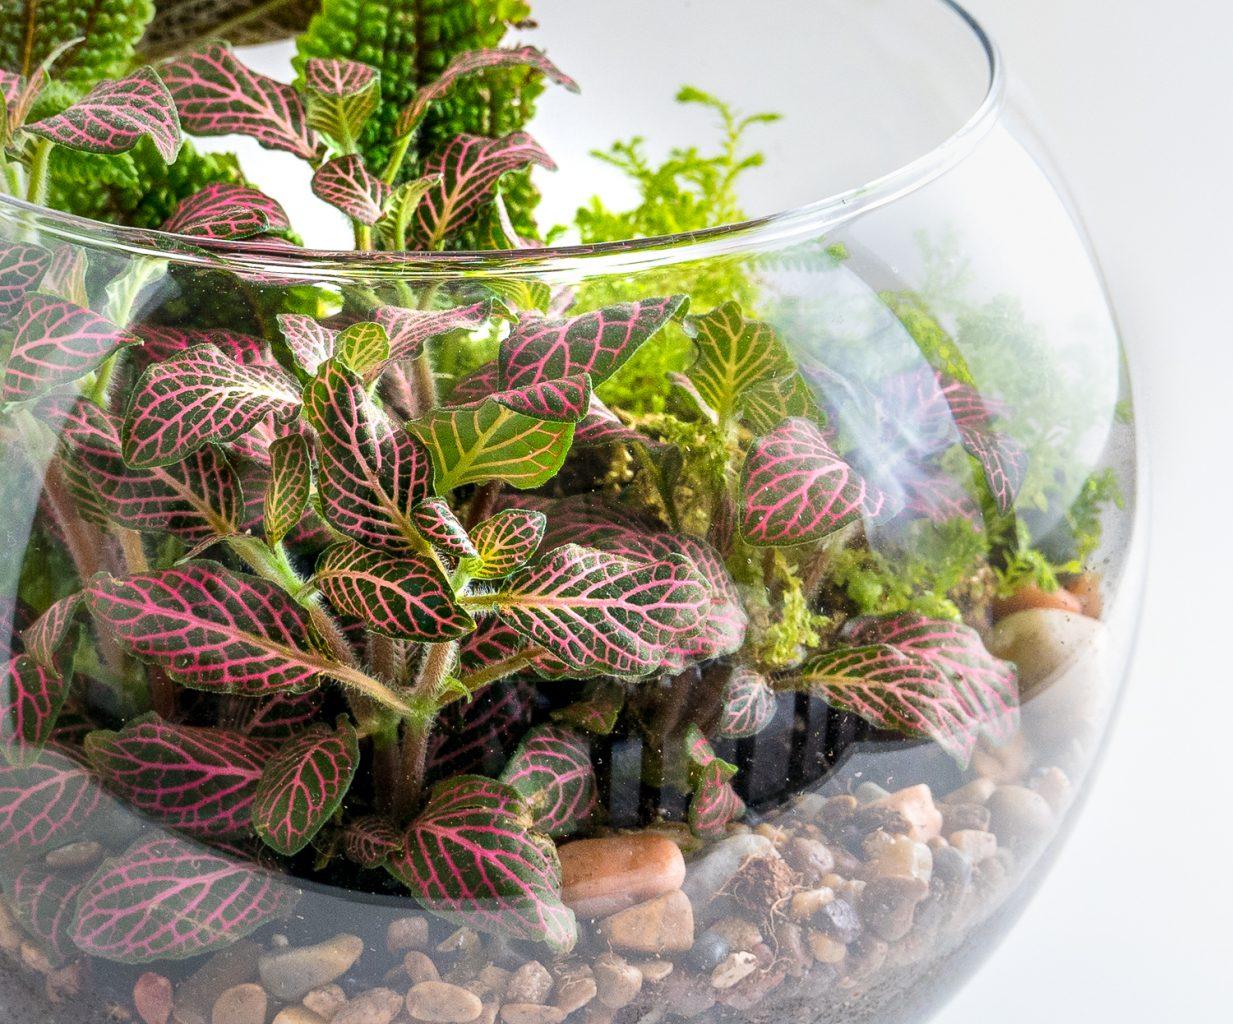 Travel and terrariums - detail of fishbowl terrarium